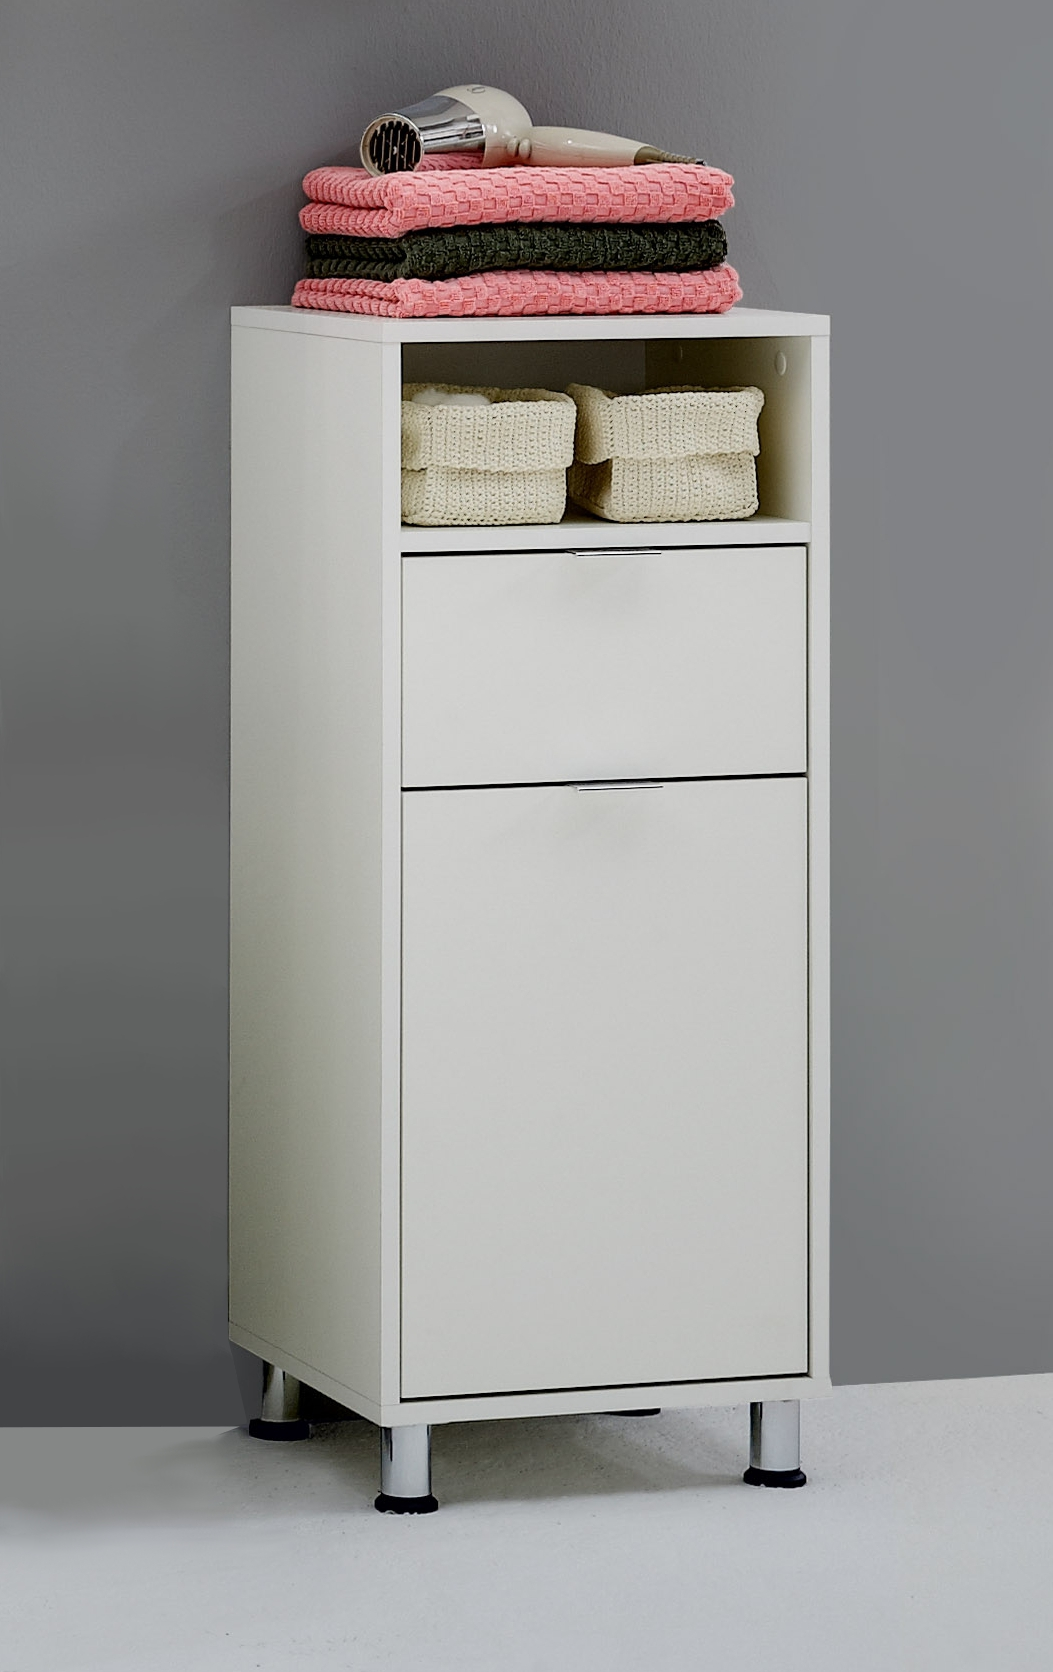 ZAMORA 2 Badezimmer-Kommode weiß